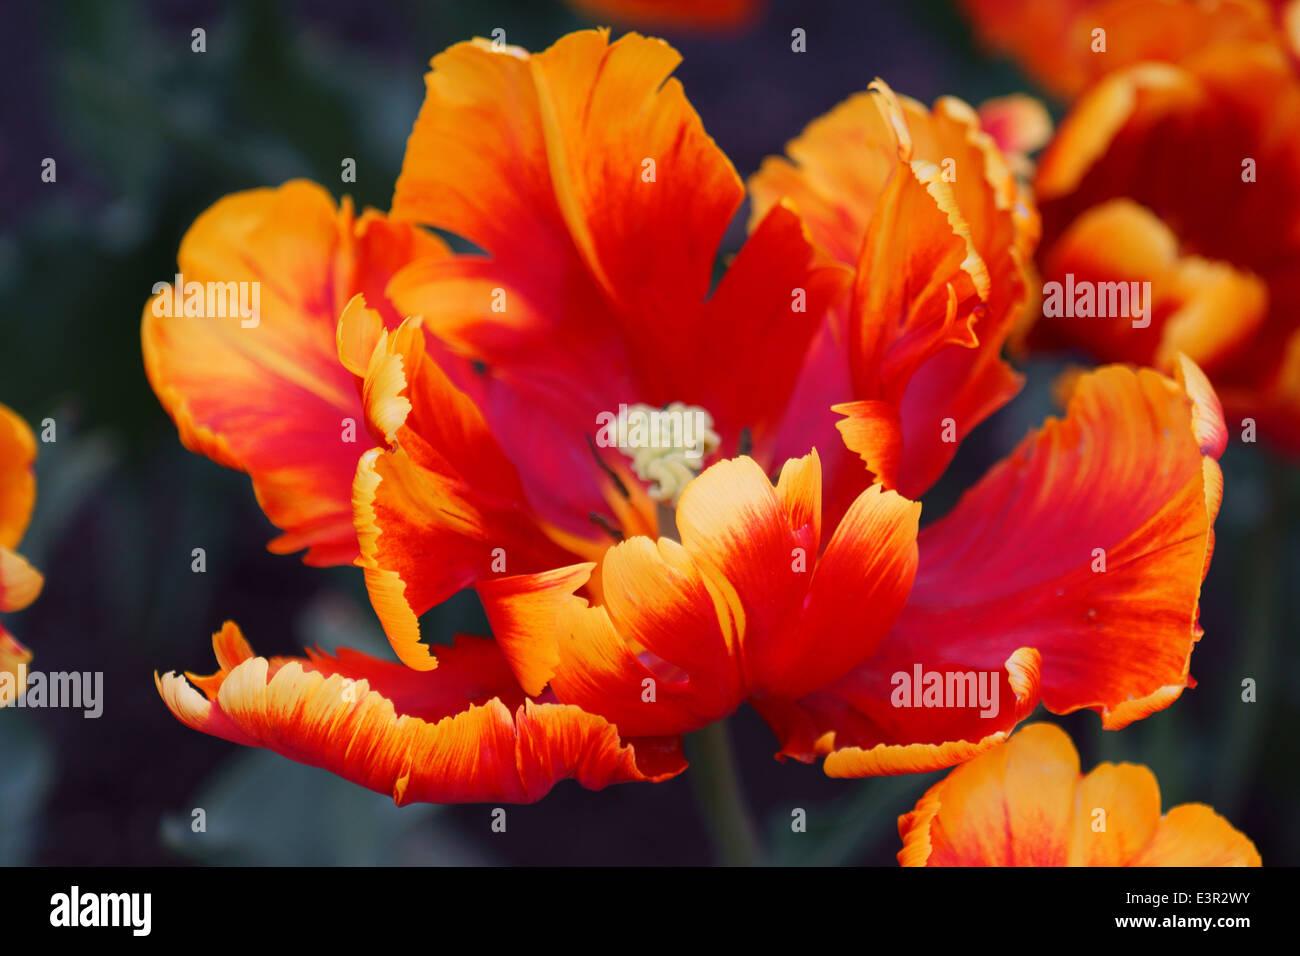 Orange ragged tulip flower close up - Stock Image